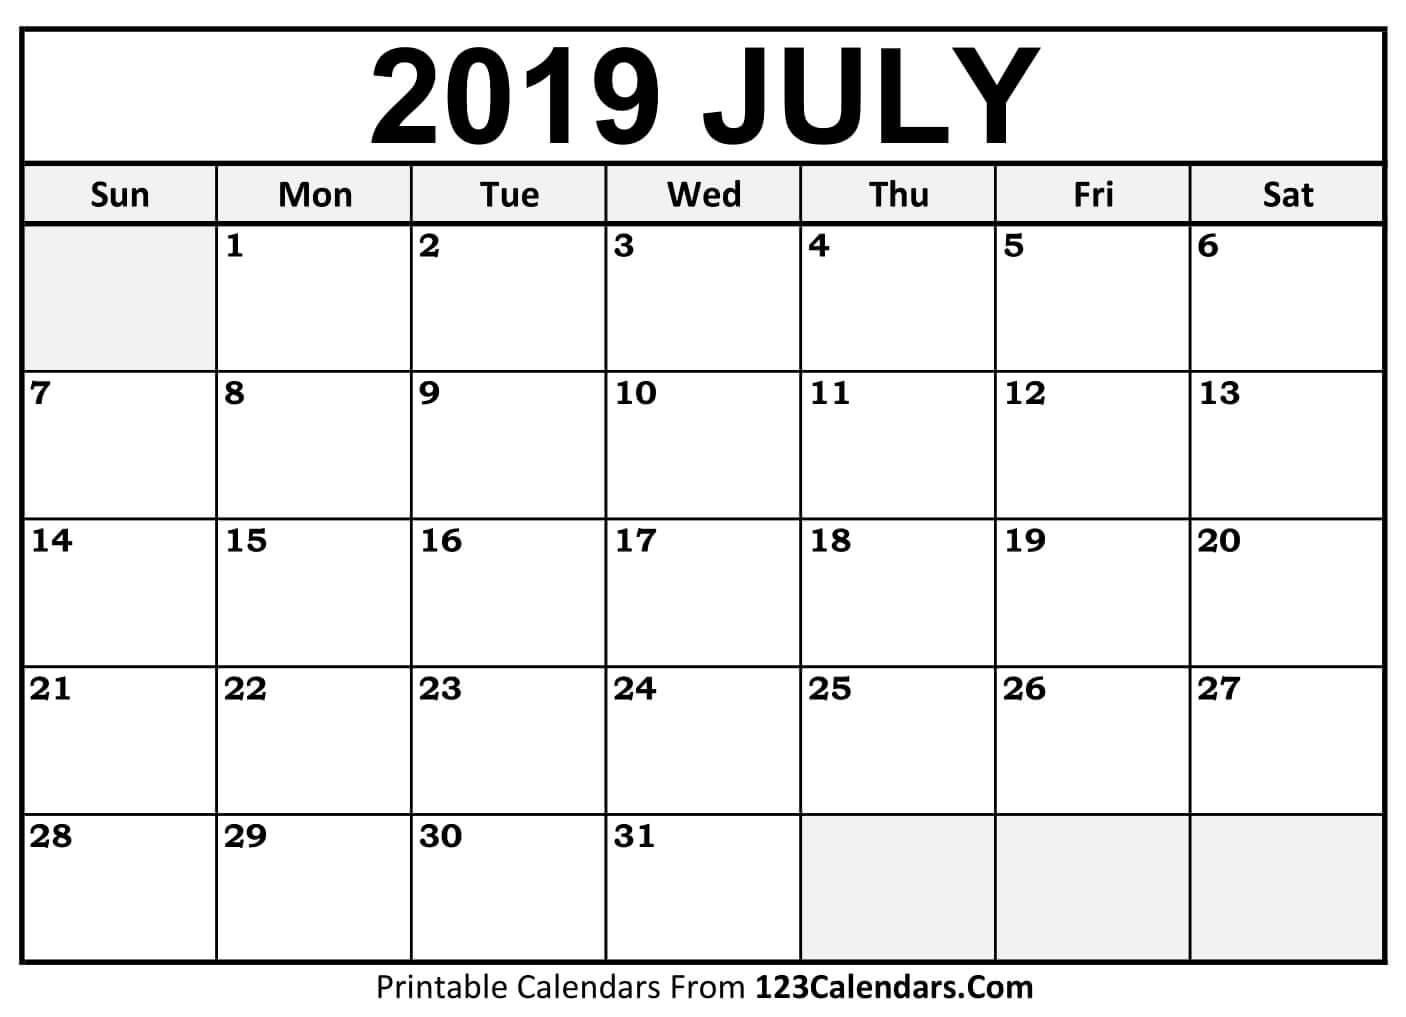 Calendar for July 2019